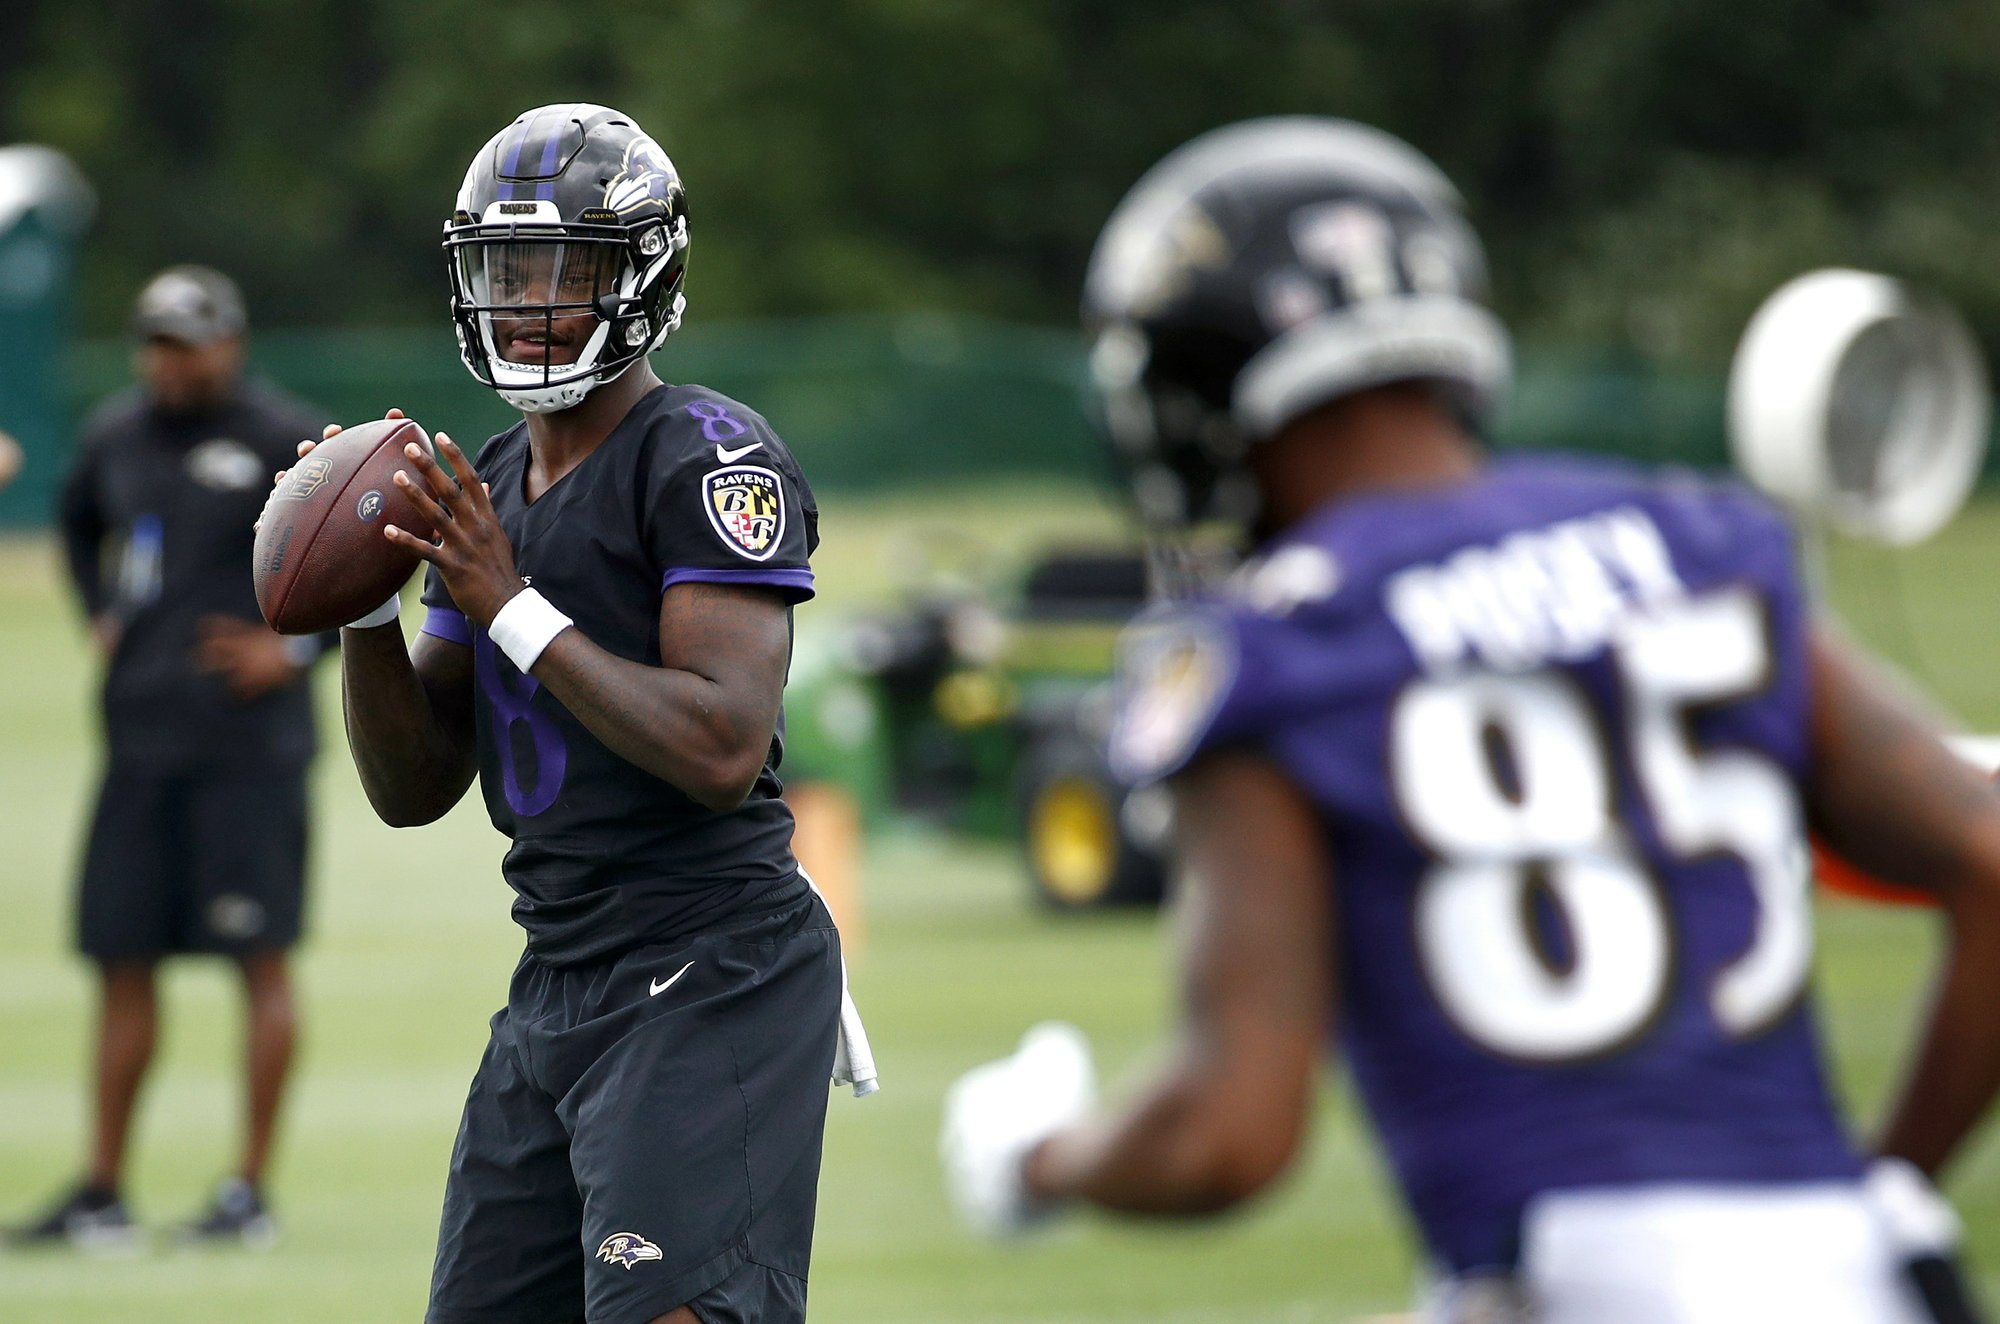 Ravens QB Lamar Jackson impressive at 1st NFL training camp 627adb444